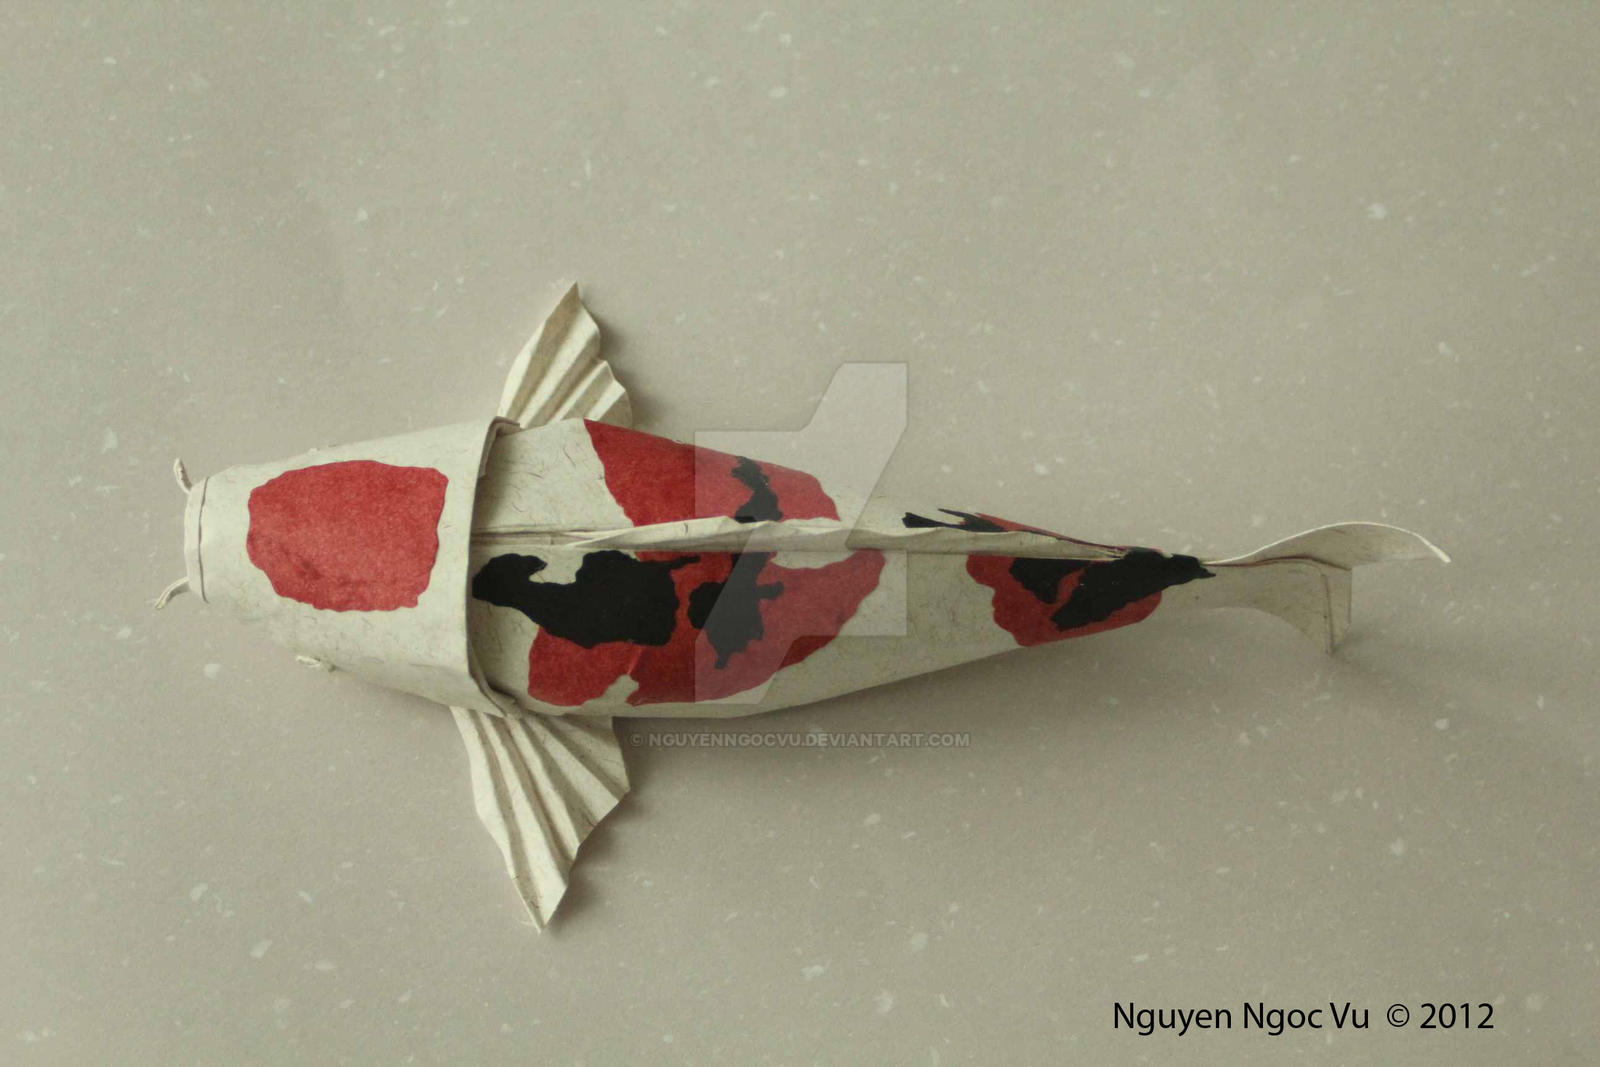 Koi fish by Nguyenngocvu